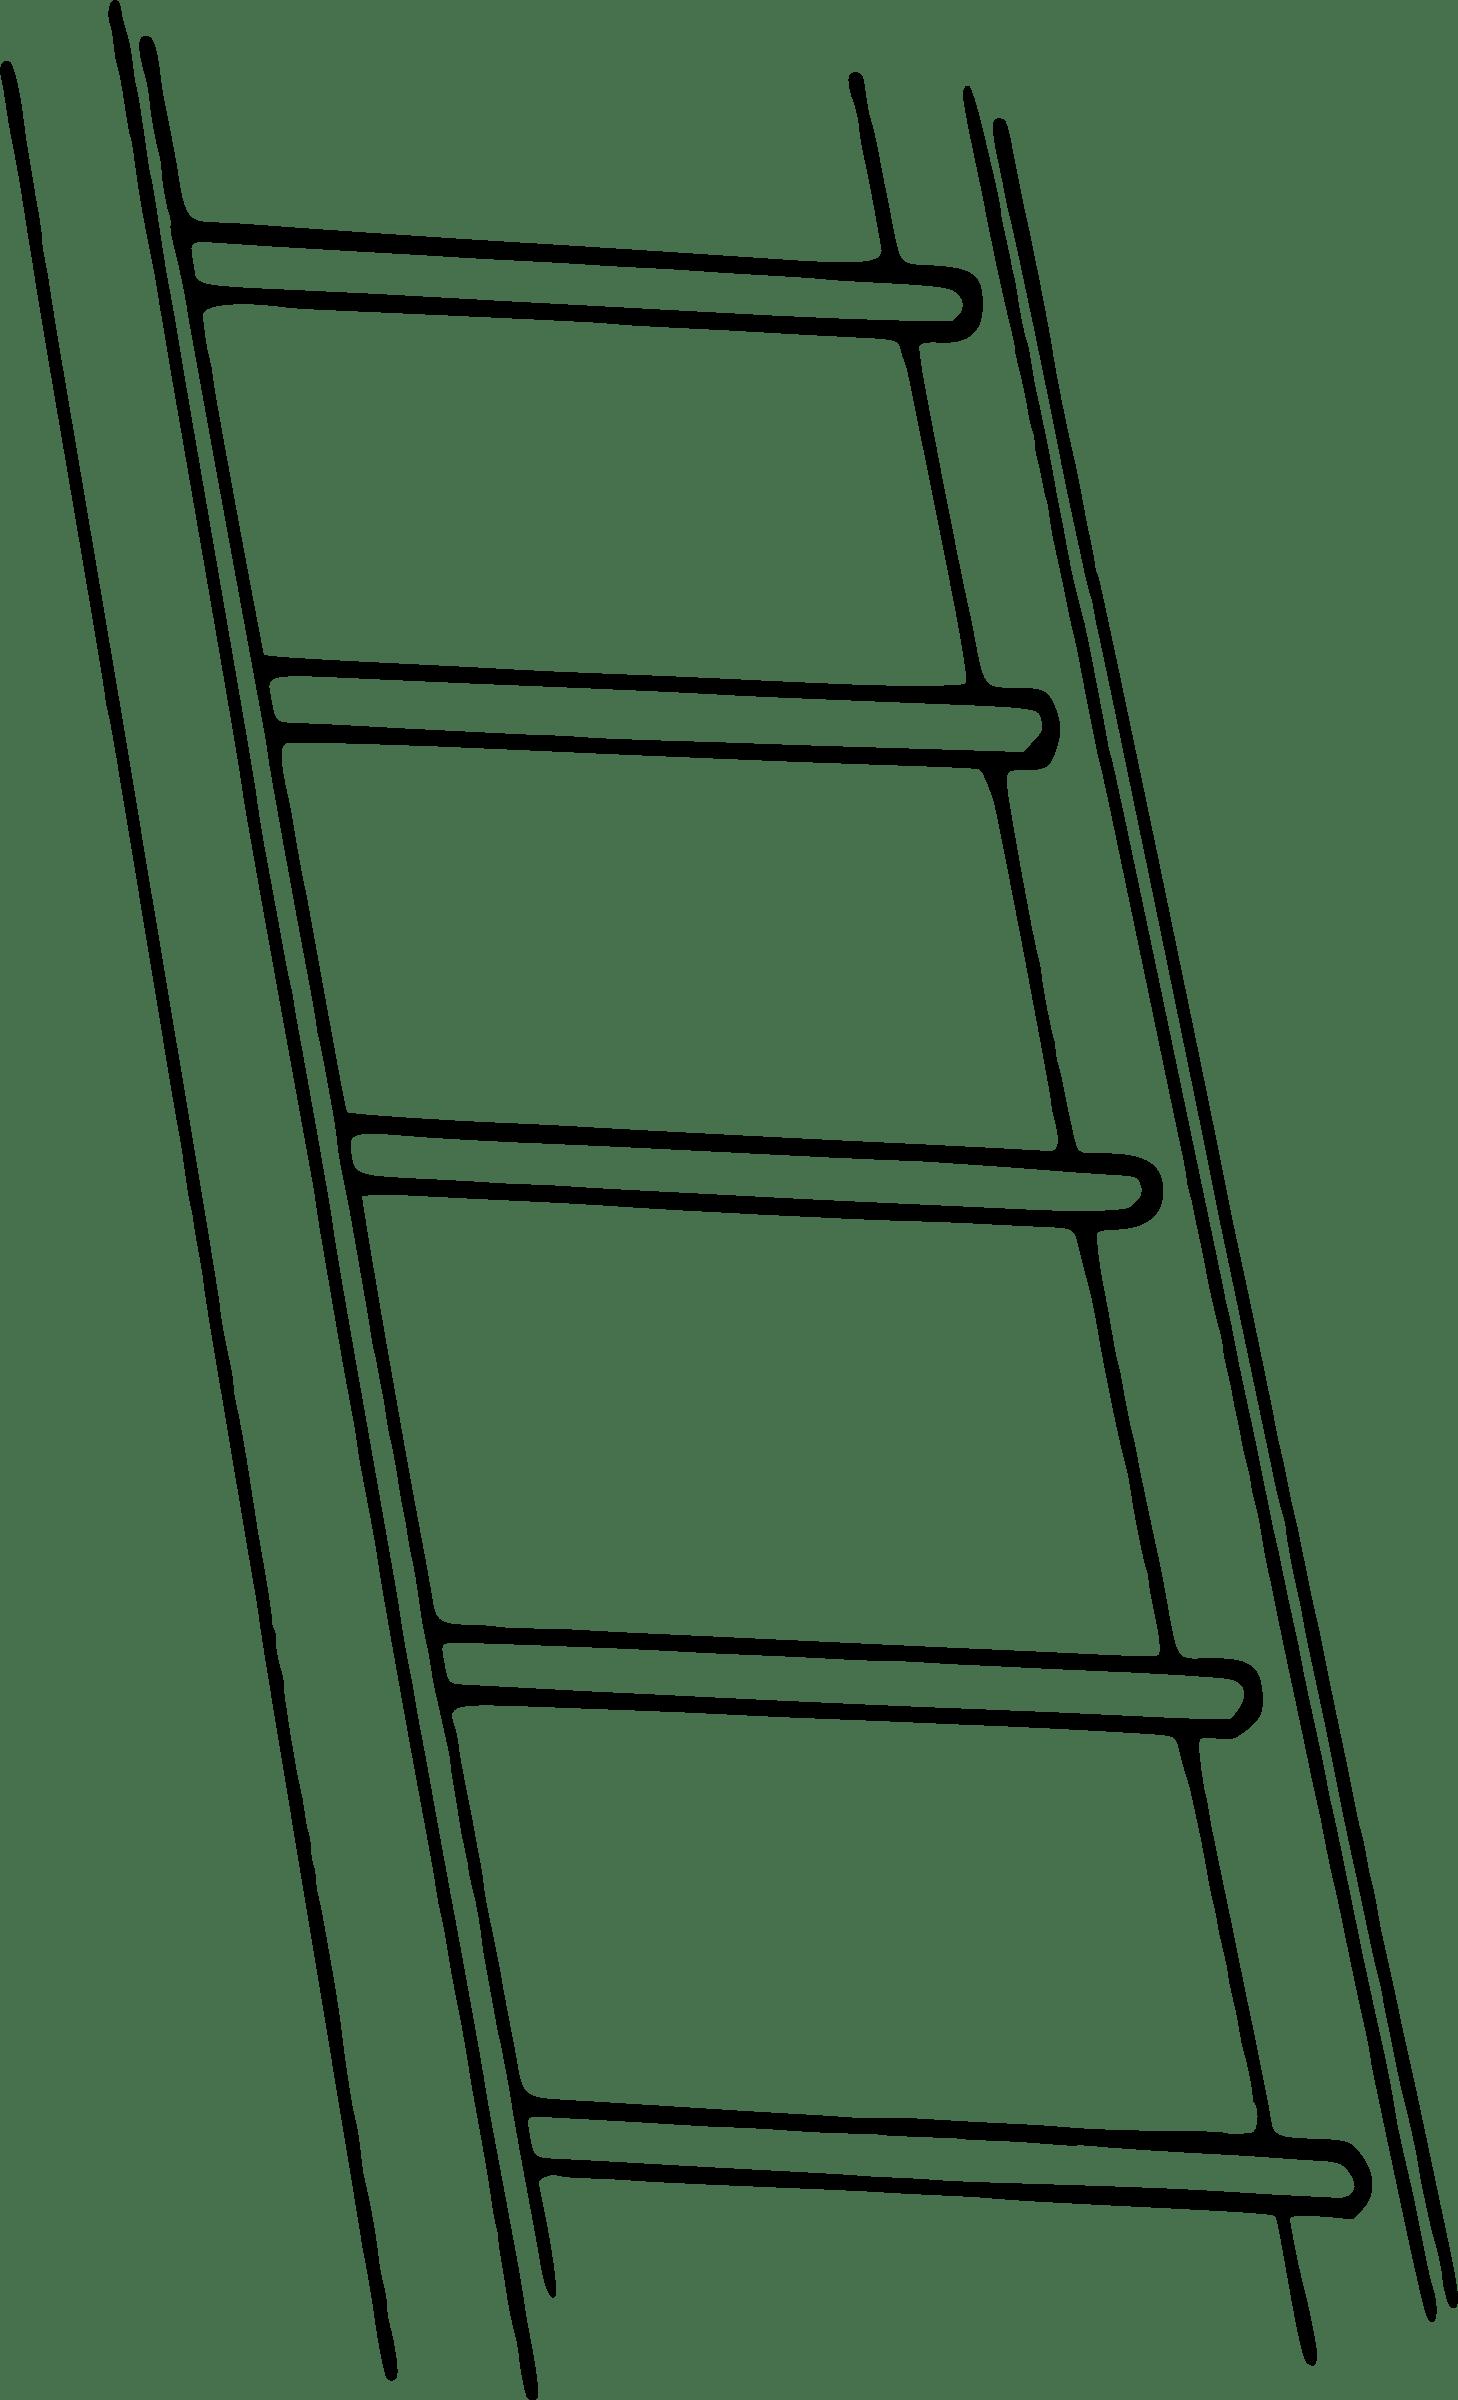 Ladder Clipart Blank Ladder Blank Transparent Free For